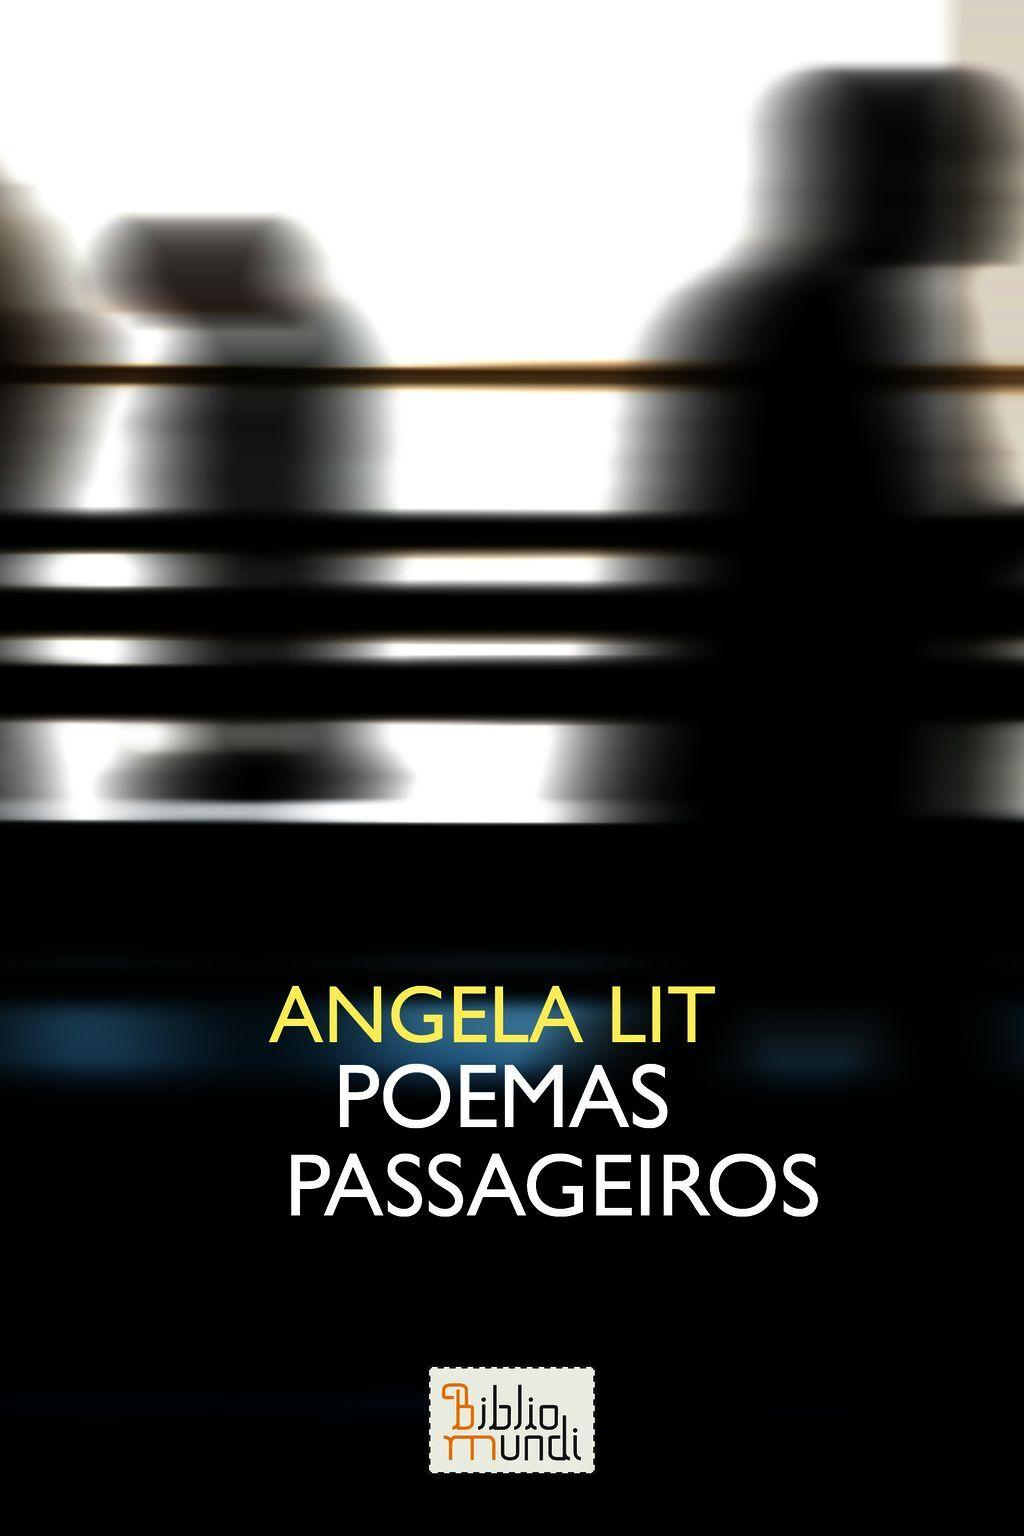 Poemas Passageiros